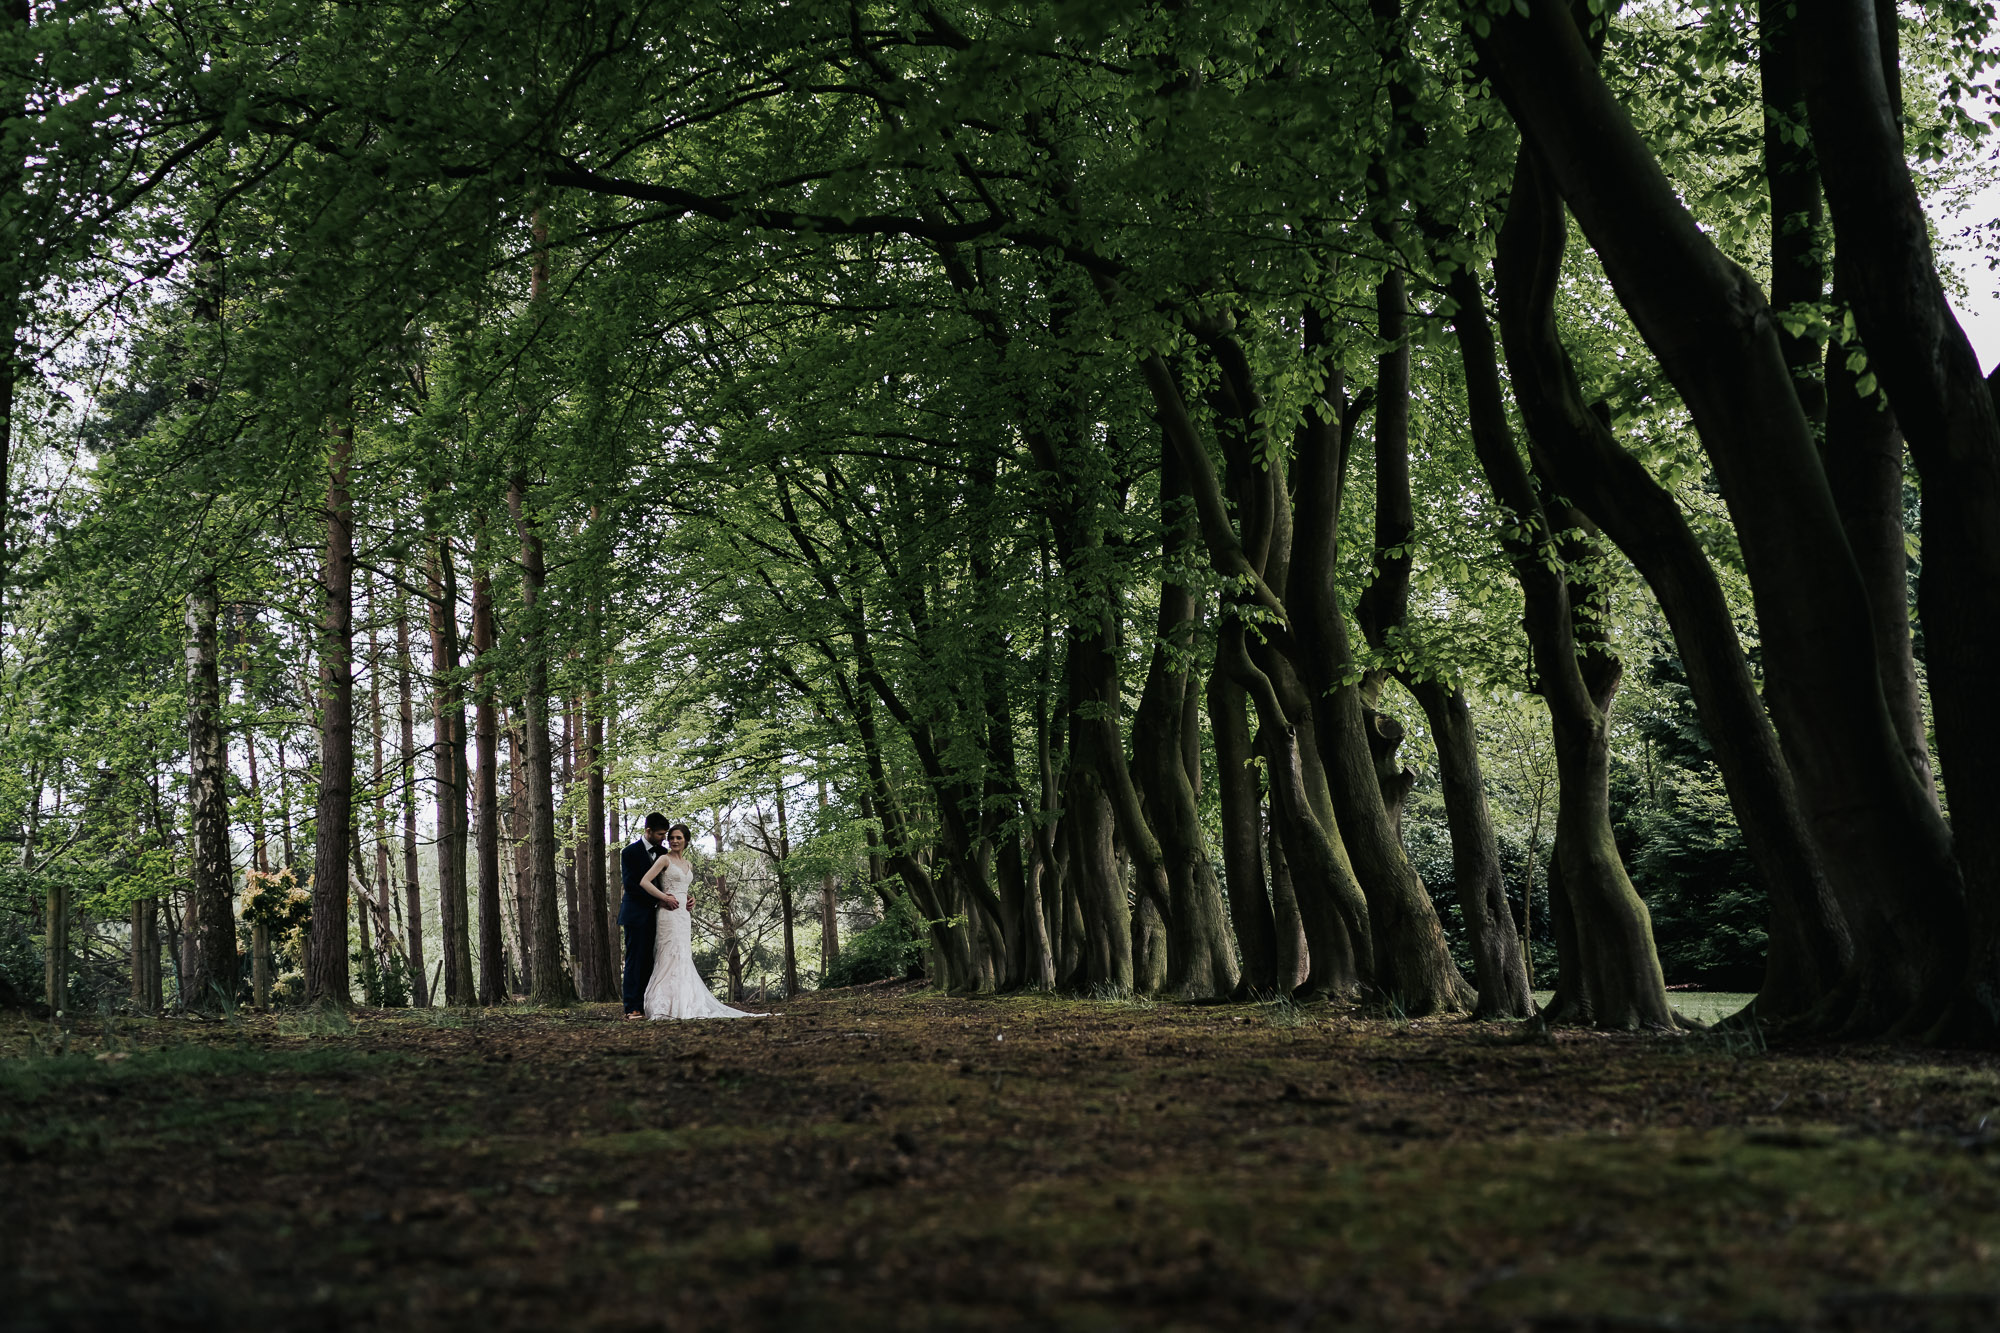 Nunsmere Hall Hotel Wedding photograhpy in cheshire wedding photographer (35 of 42).jpg